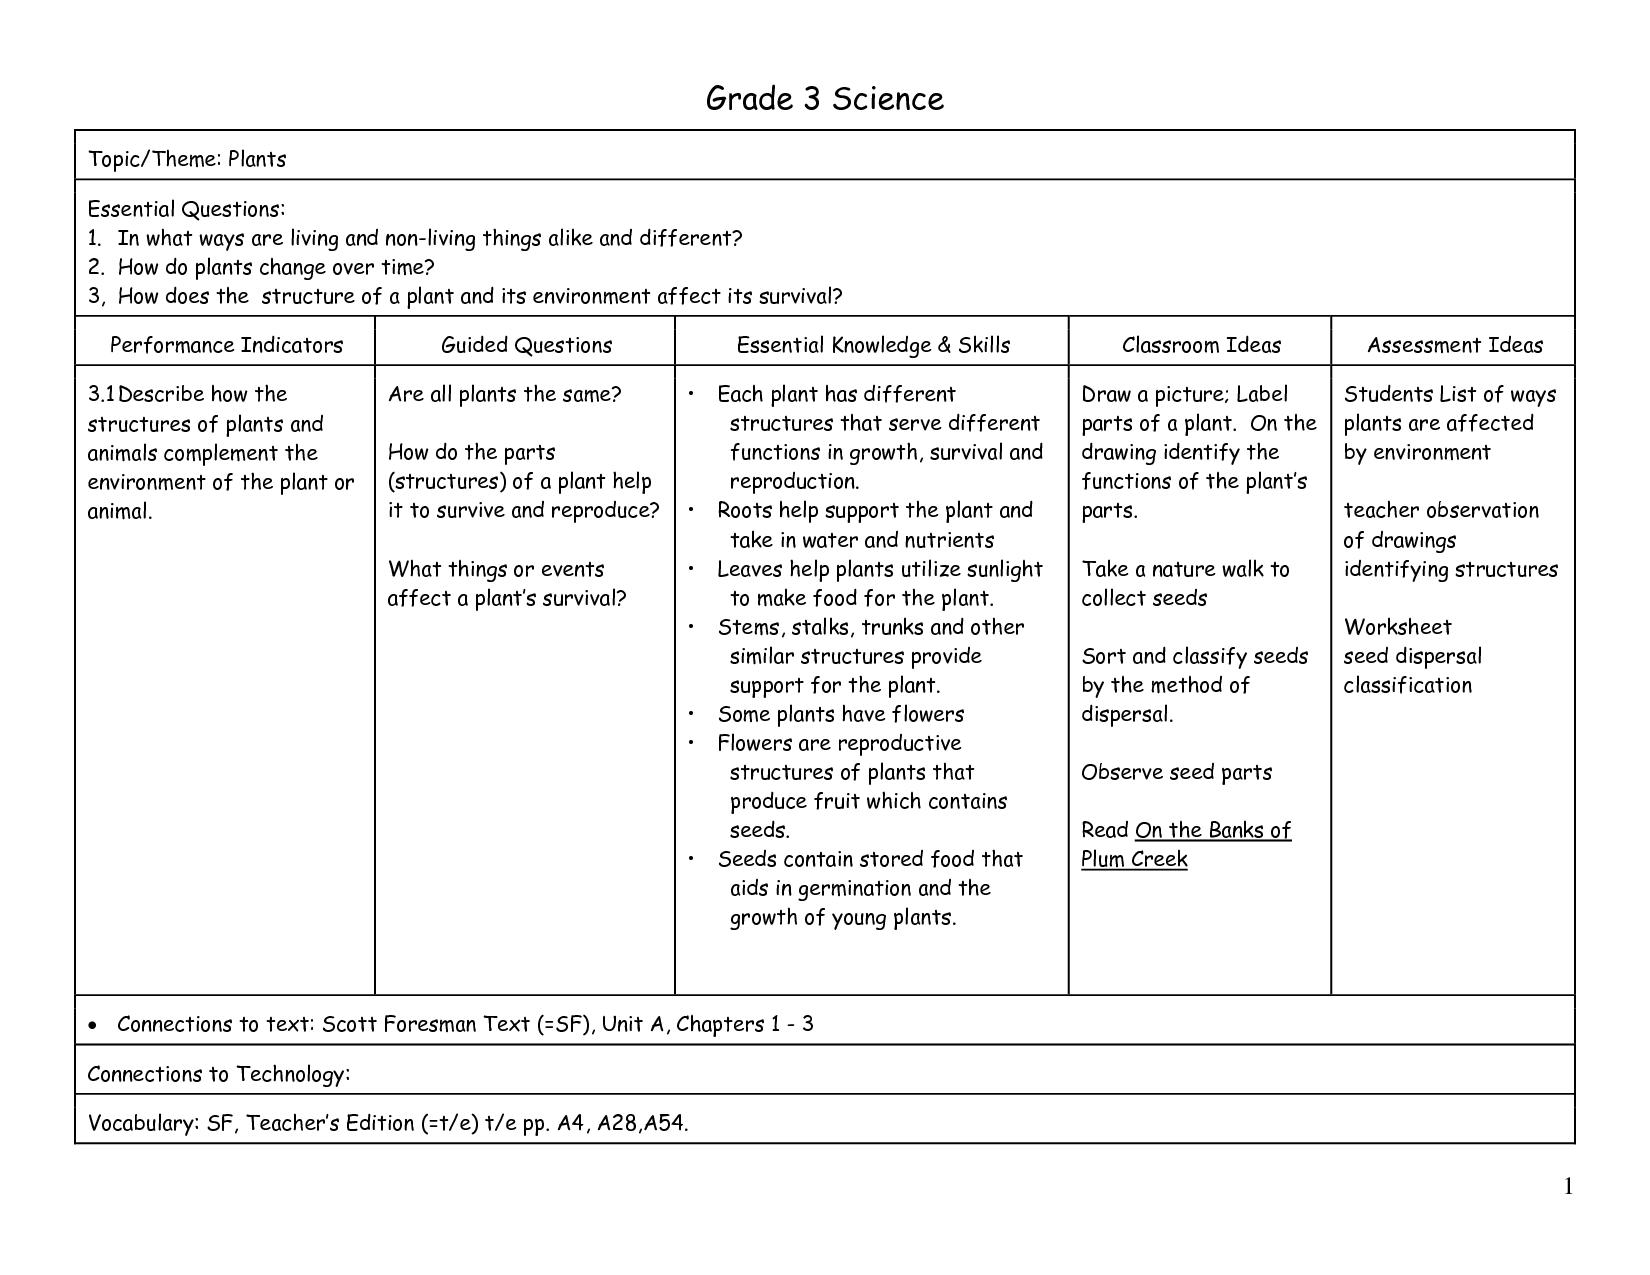 Plants Grade 3 Grade 3 Science Worksheet Pdf Science Worksheets Grade 3 Science Science [ 1275 x 1650 Pixel ]